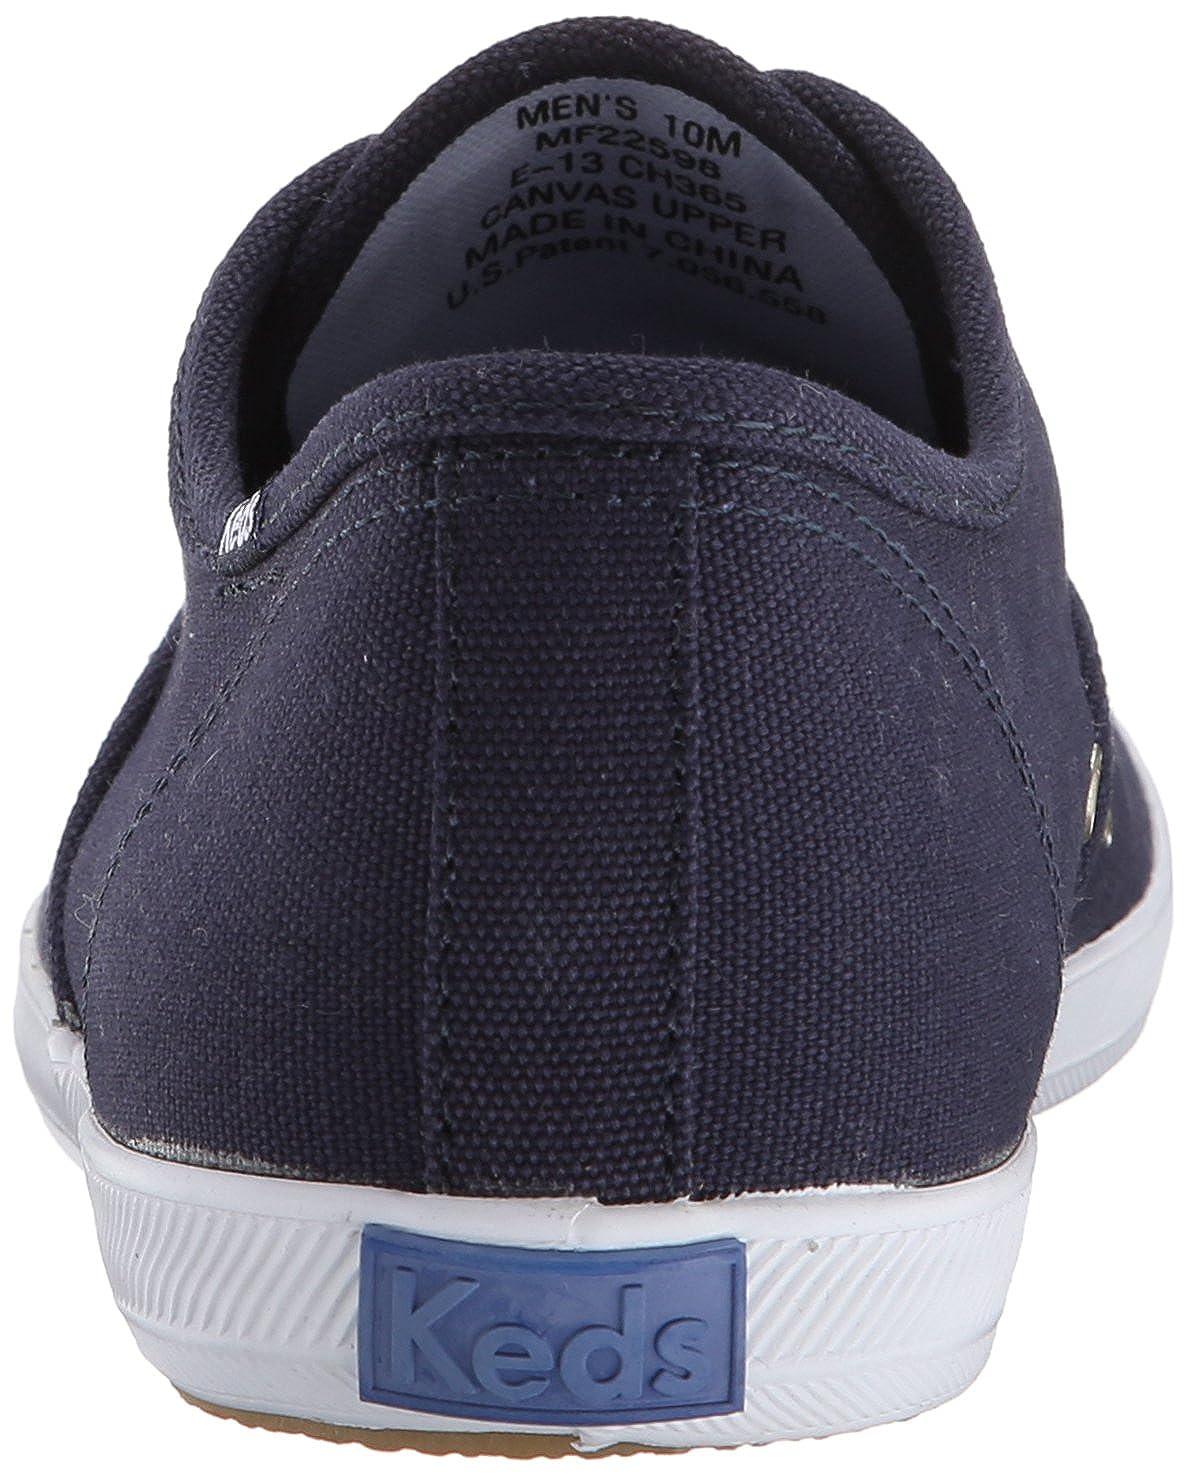 501ba0826499b Amazon.com  Keds Men s Champion Original Canvas Sneaker  Shoes